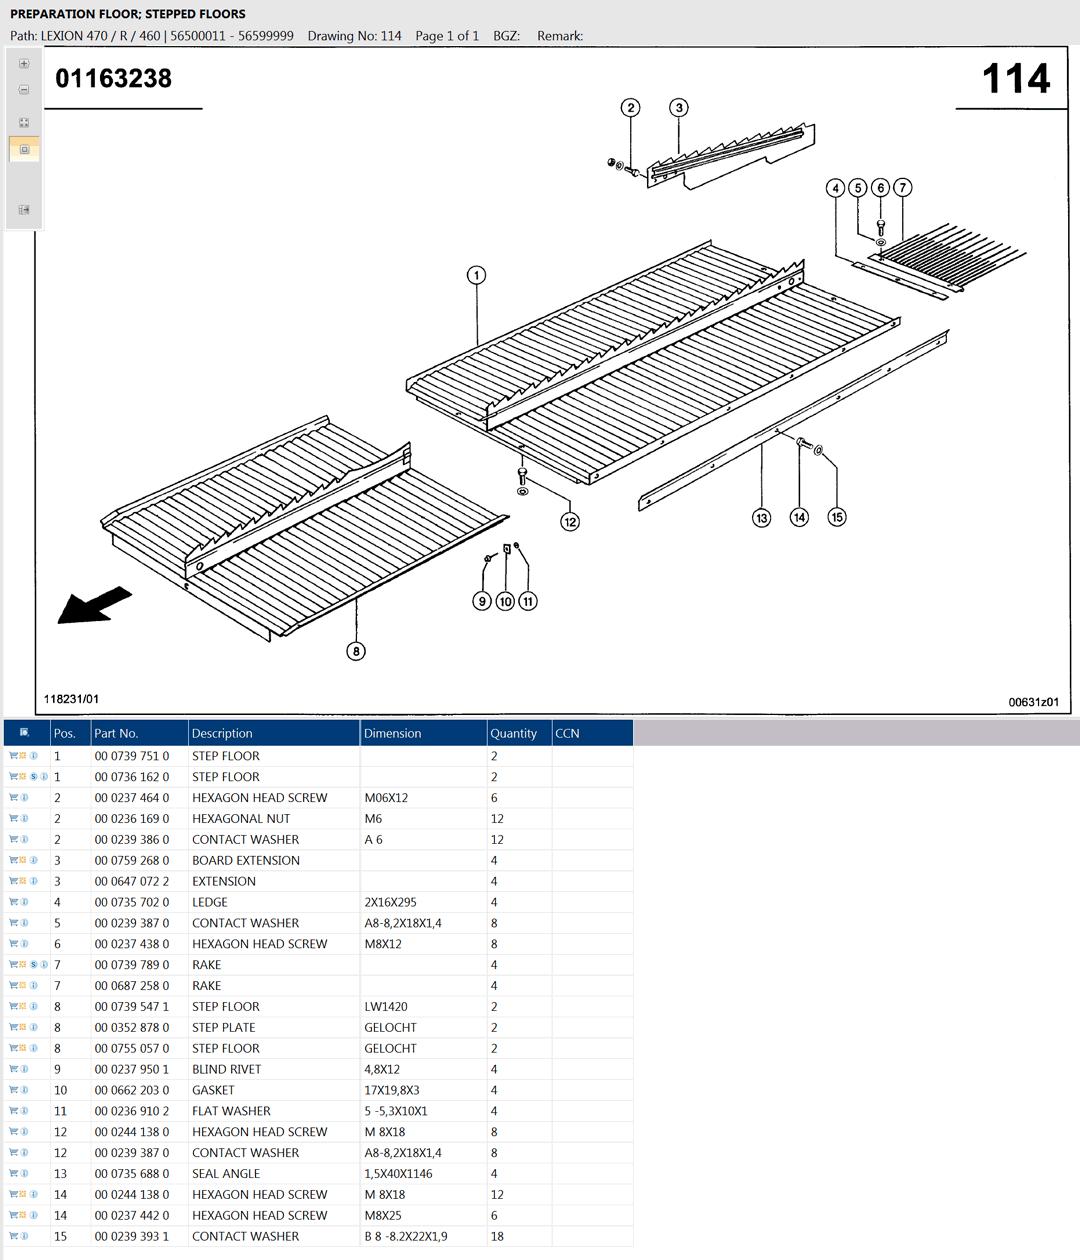 Lexion 470R parts and scheme - preparation floor, stepped floors